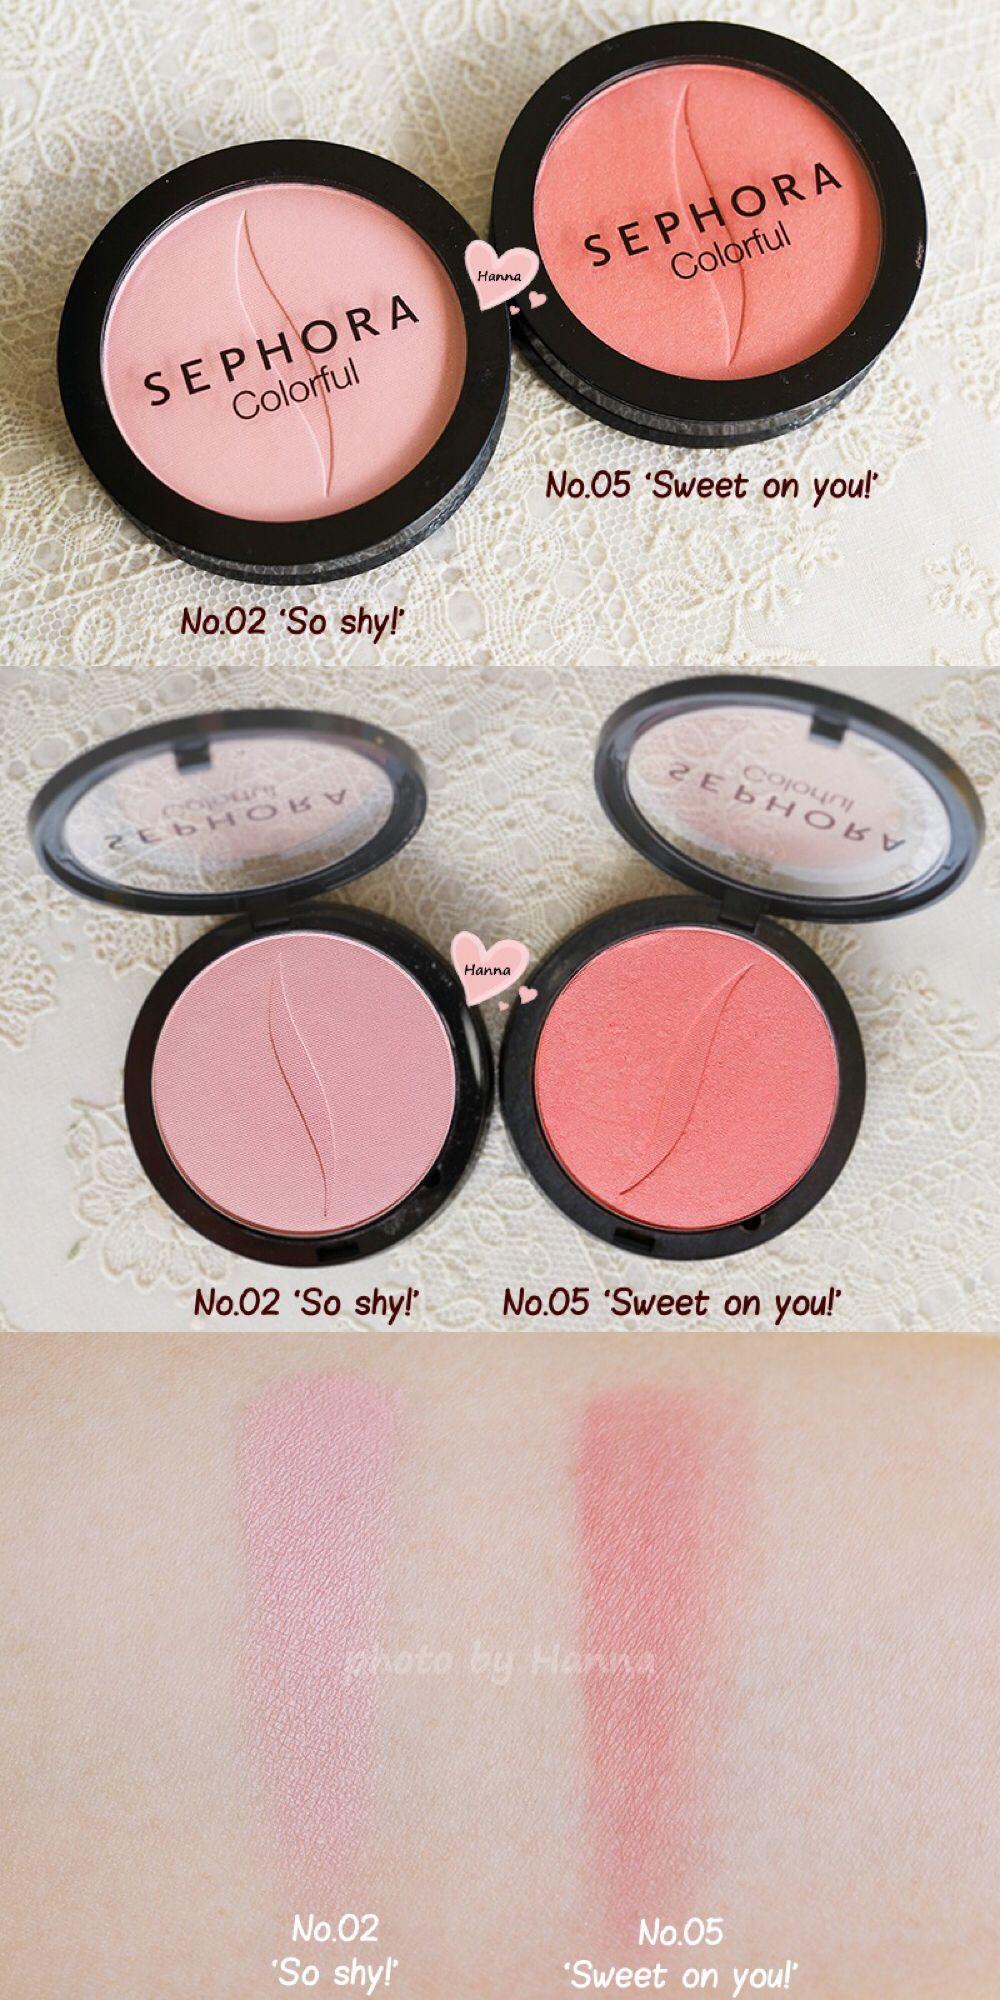 8e6e8135c1 SEPHORA Colorful Blush: 02 'So shy!' and 05 'Sweet on you ...